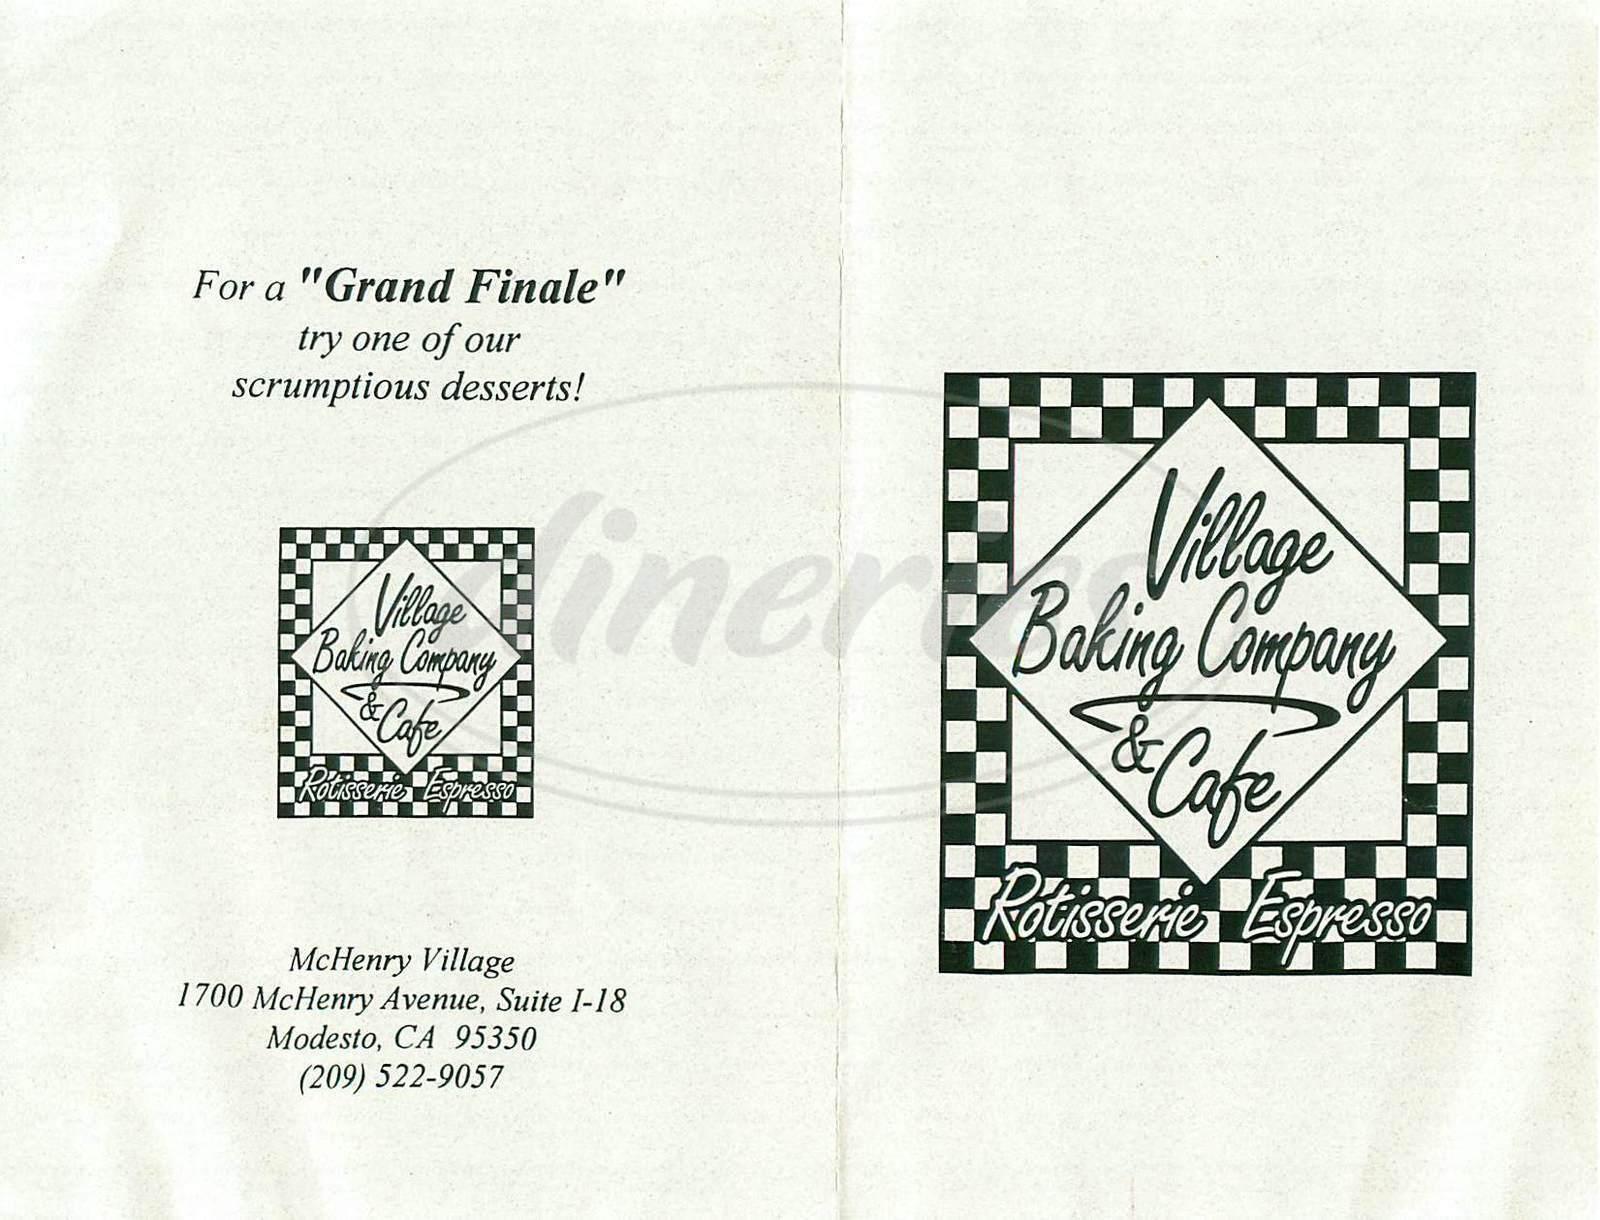 menu for Village Baking Company & Cafe